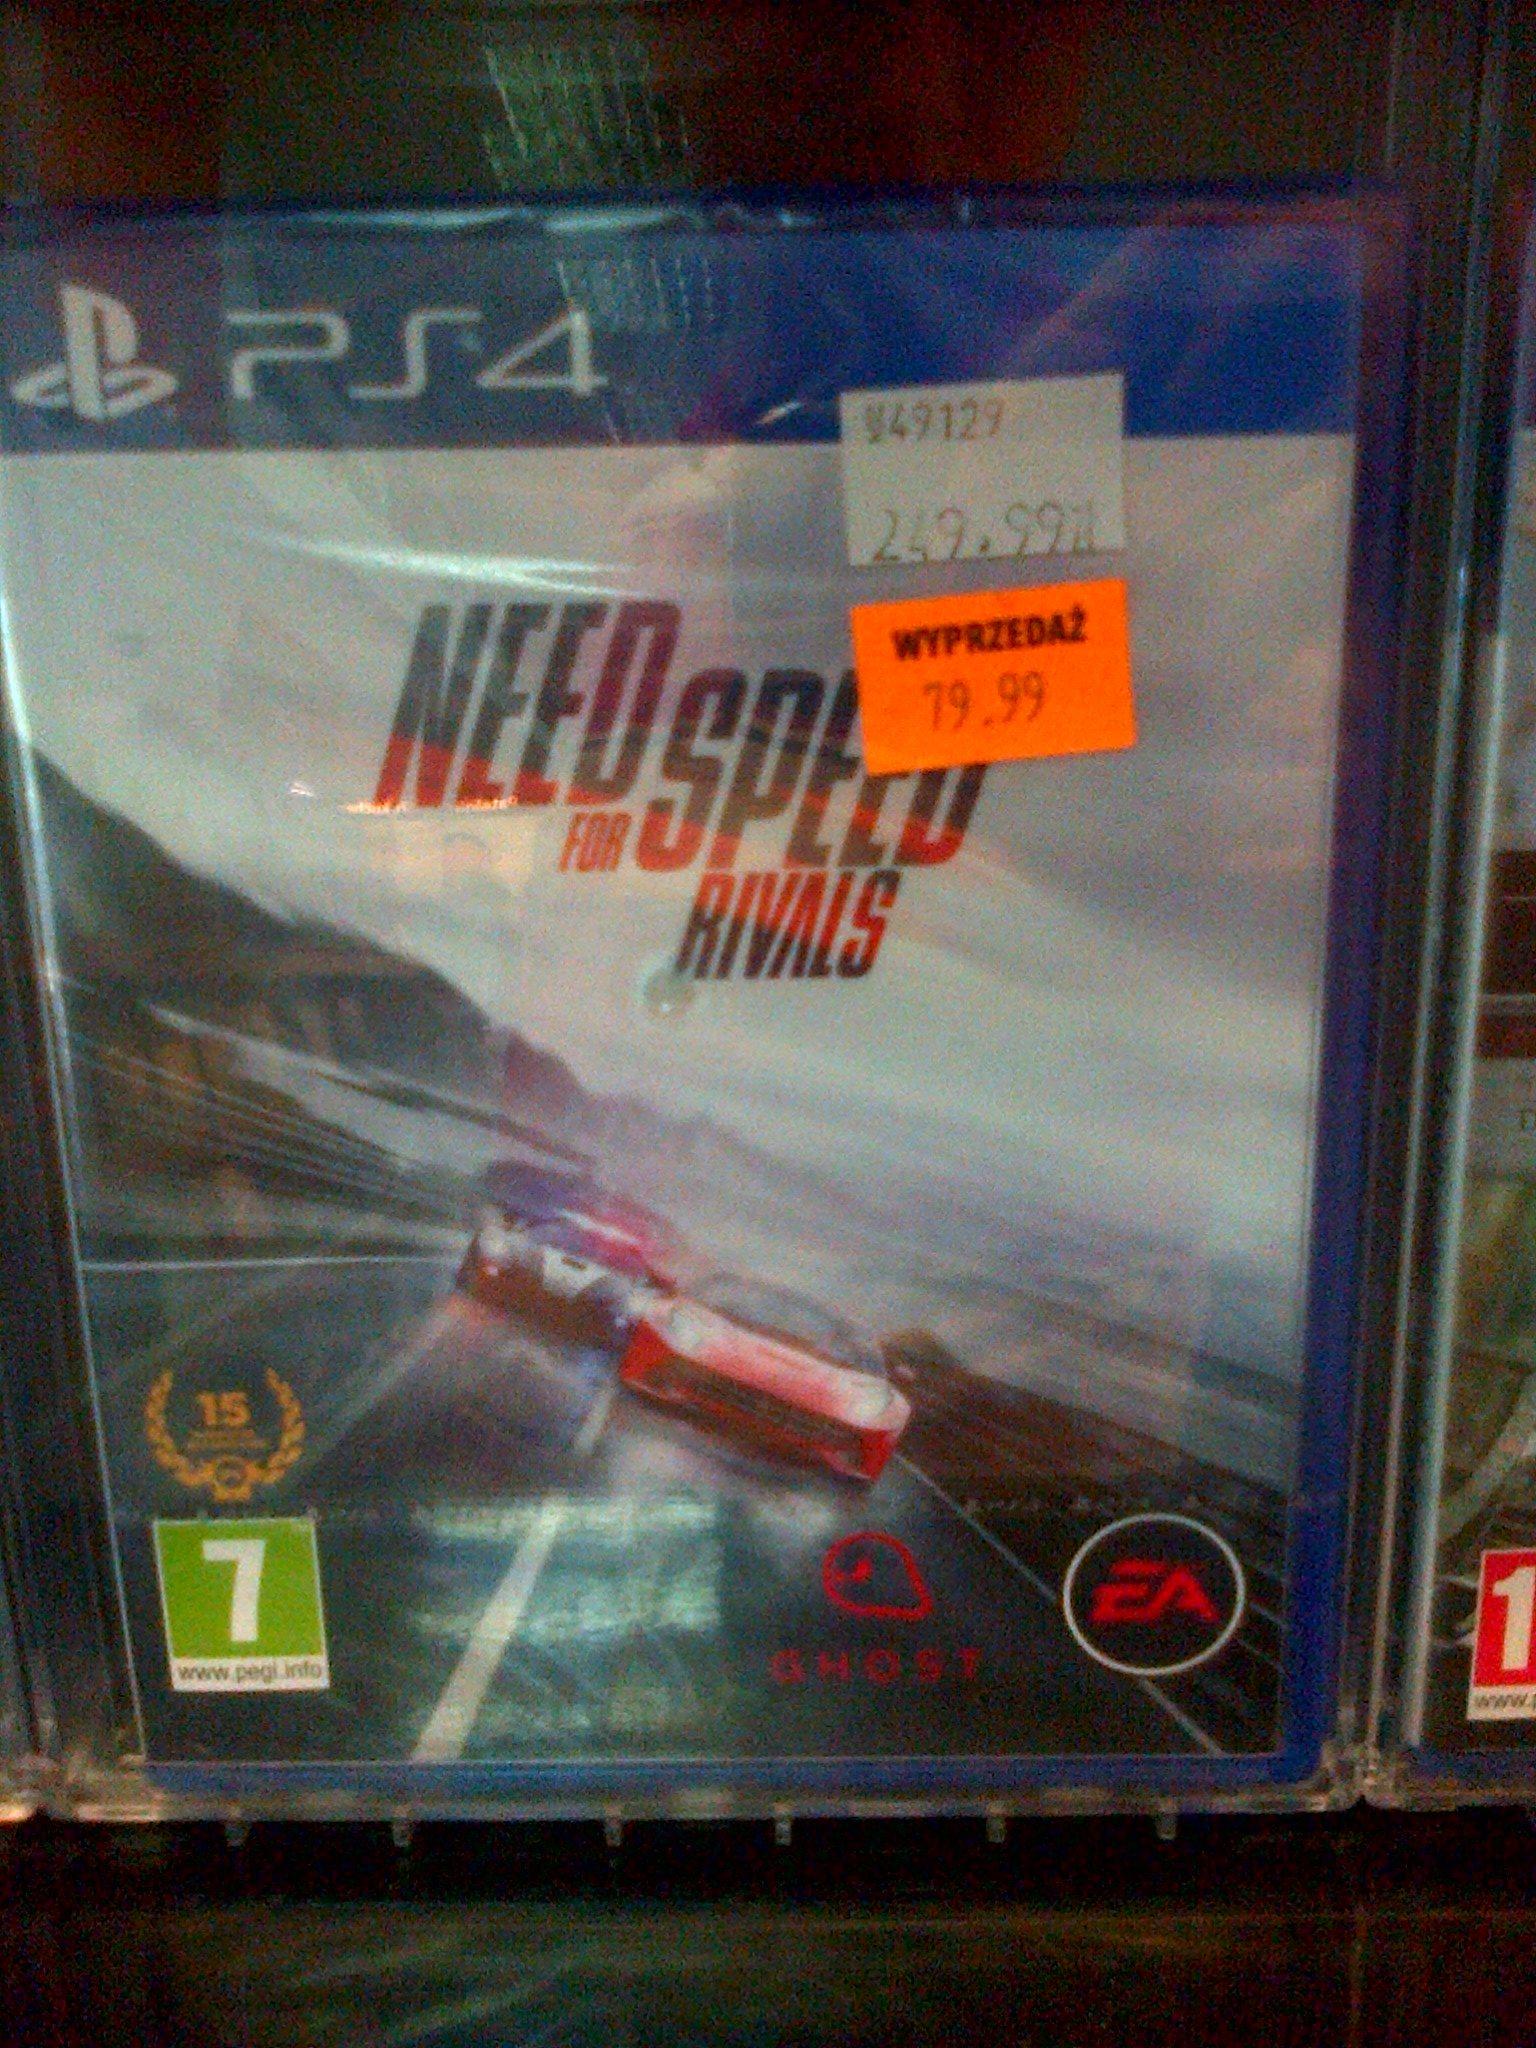 Need 4 Speed Rivals PS4 za 79,99 zł @ Avans